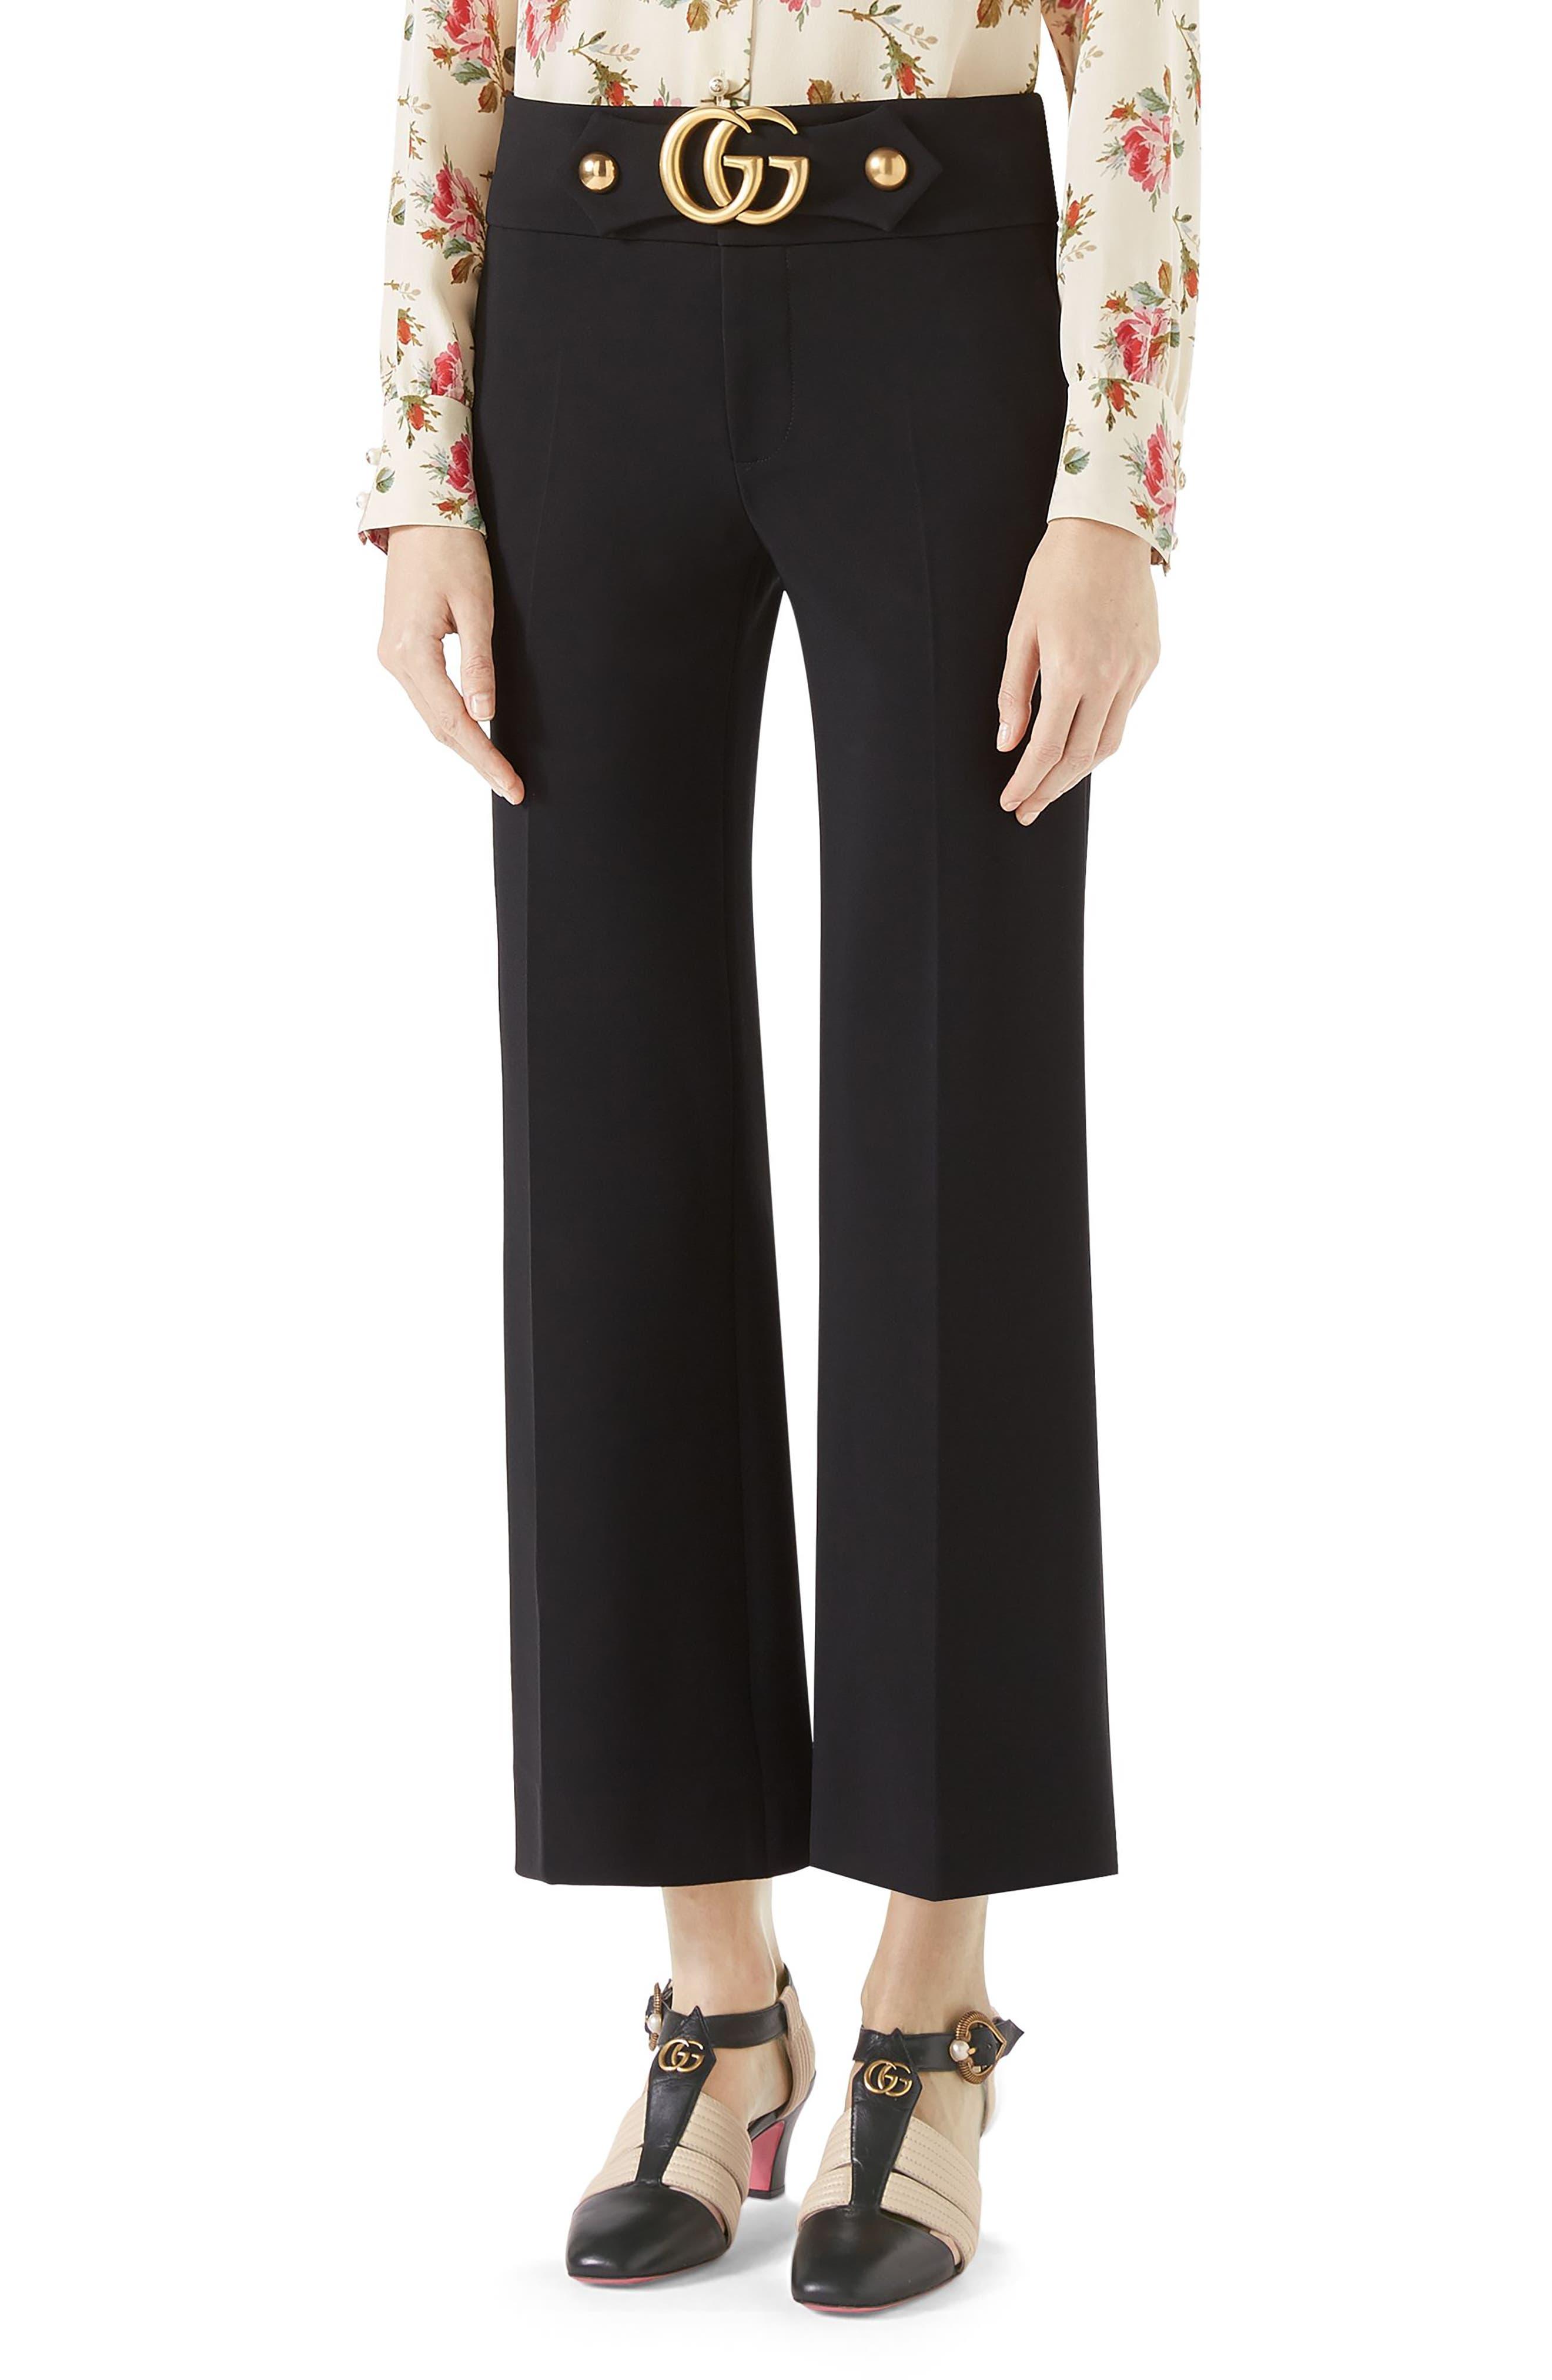 Marmont Stretch Jersey Crop Pants,                         Main,                         color, Black